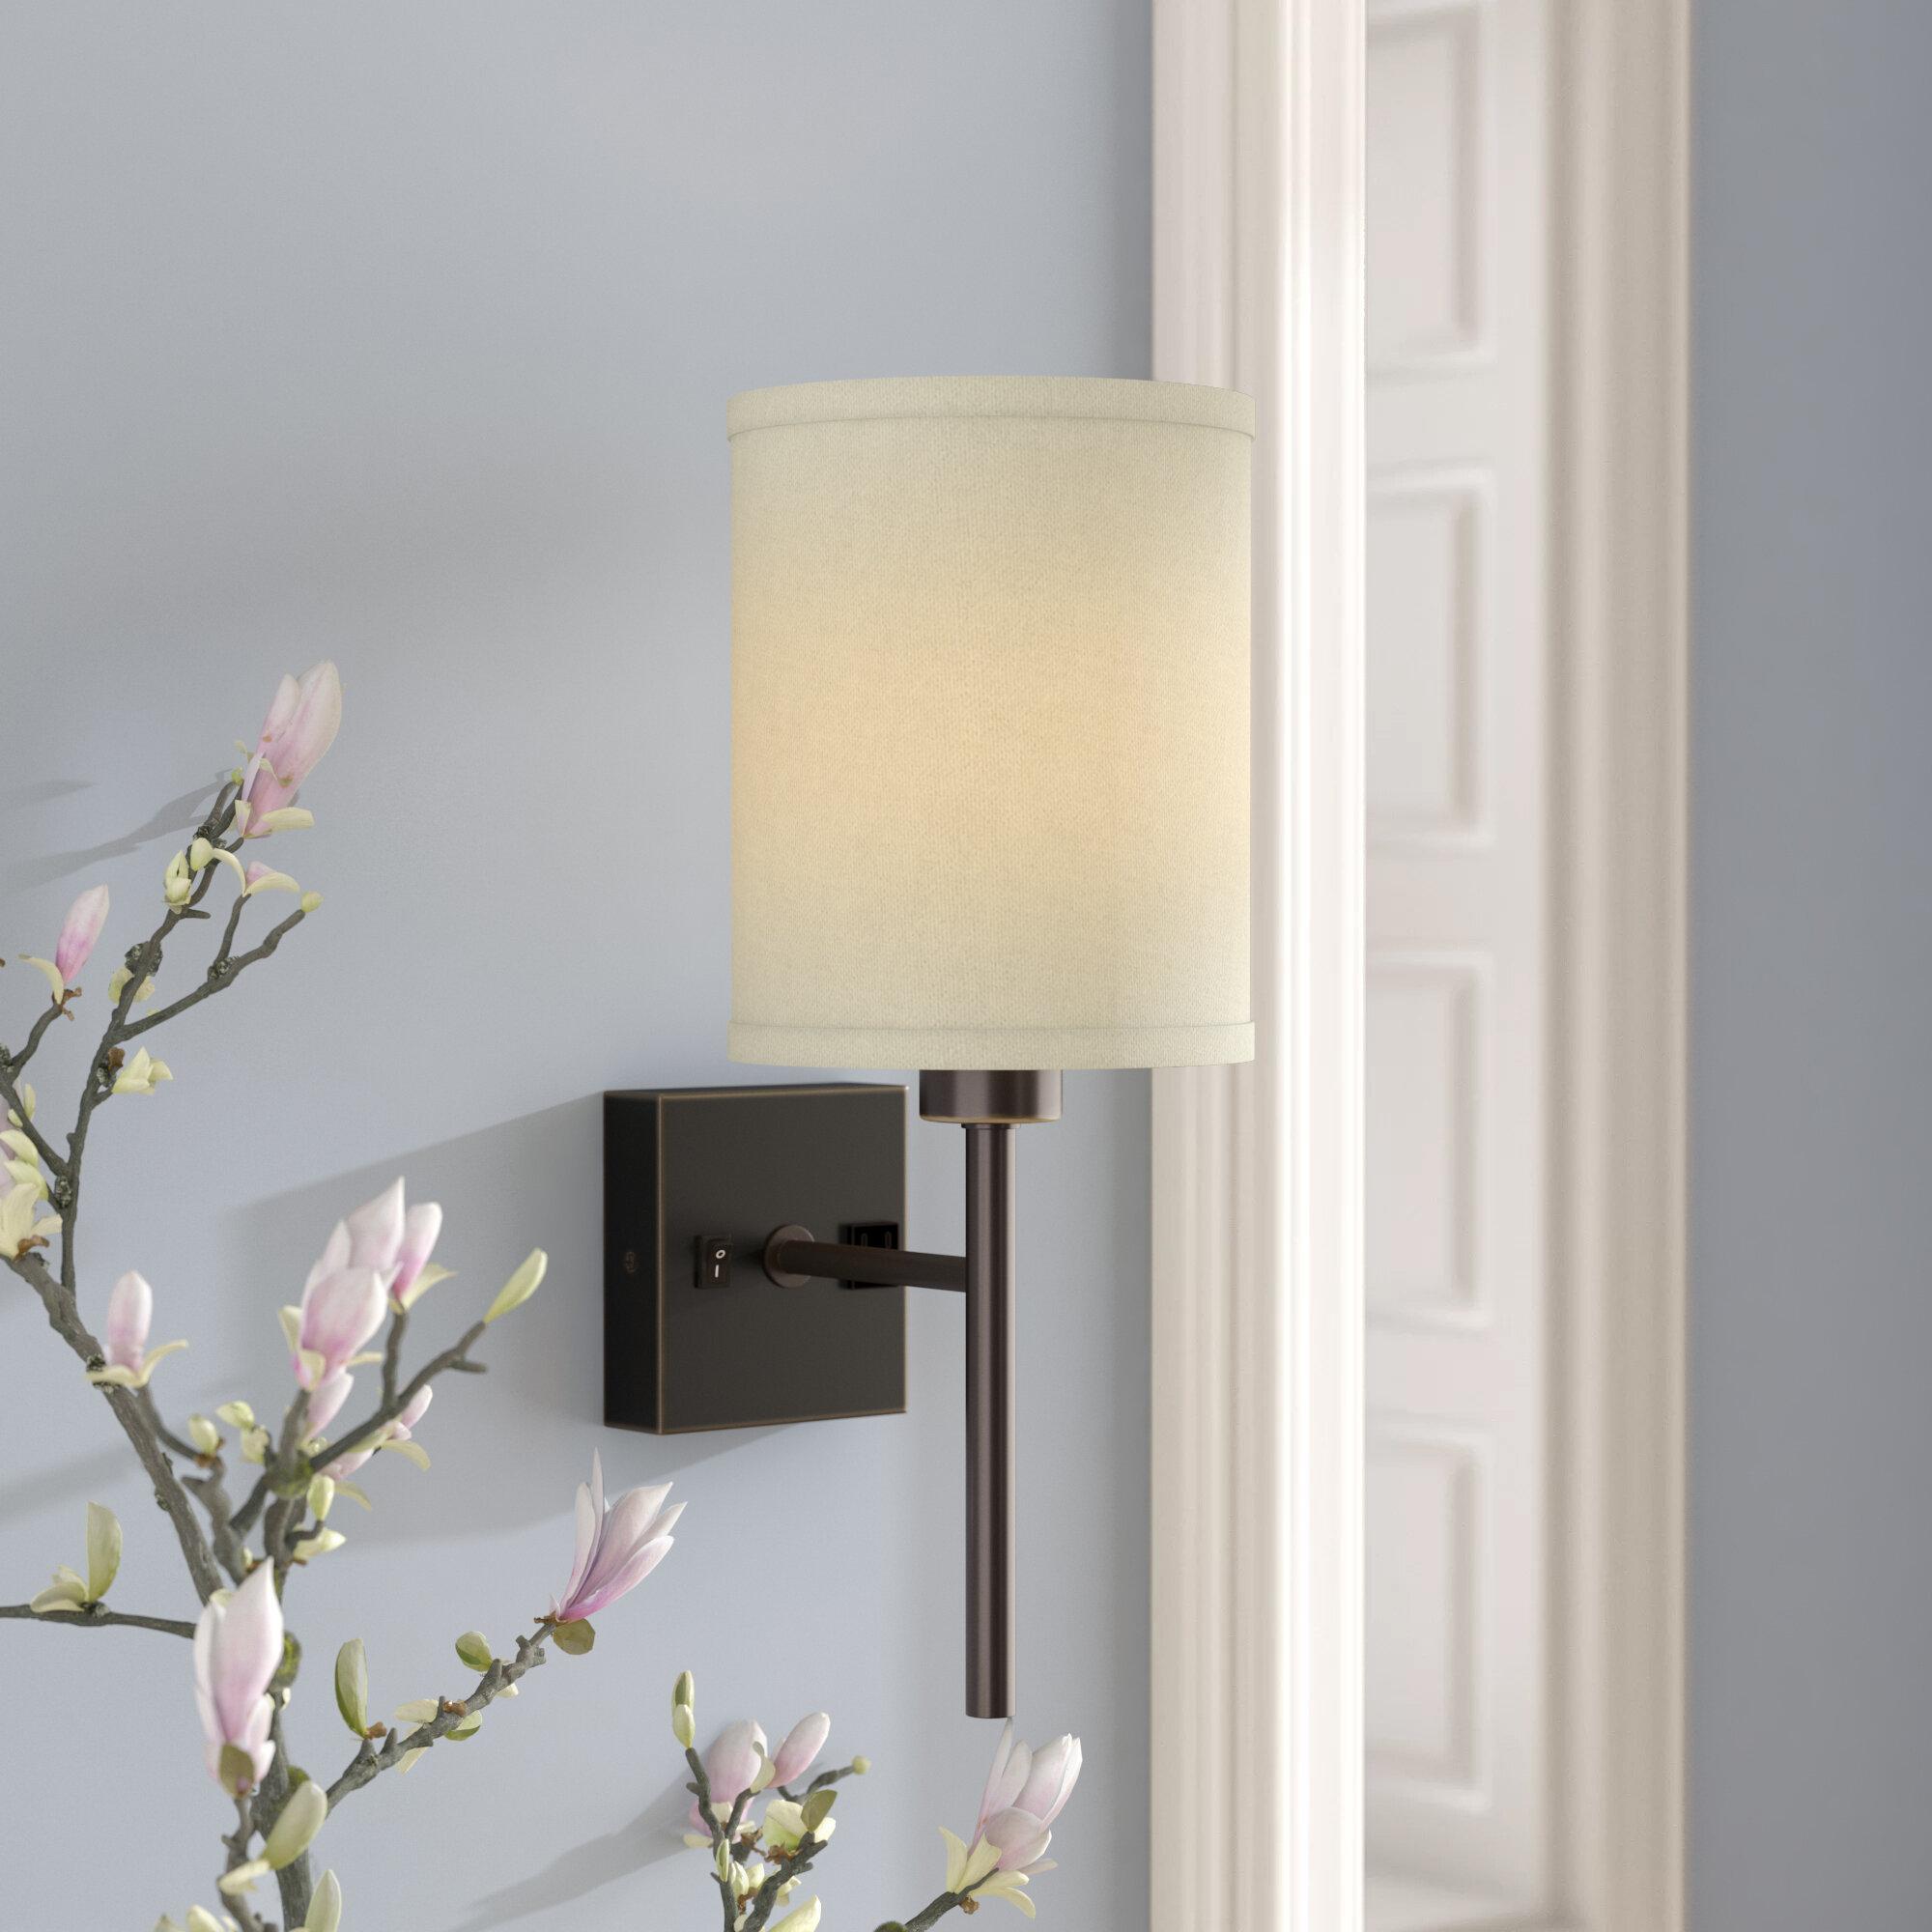 hilary 1 light wall sconce